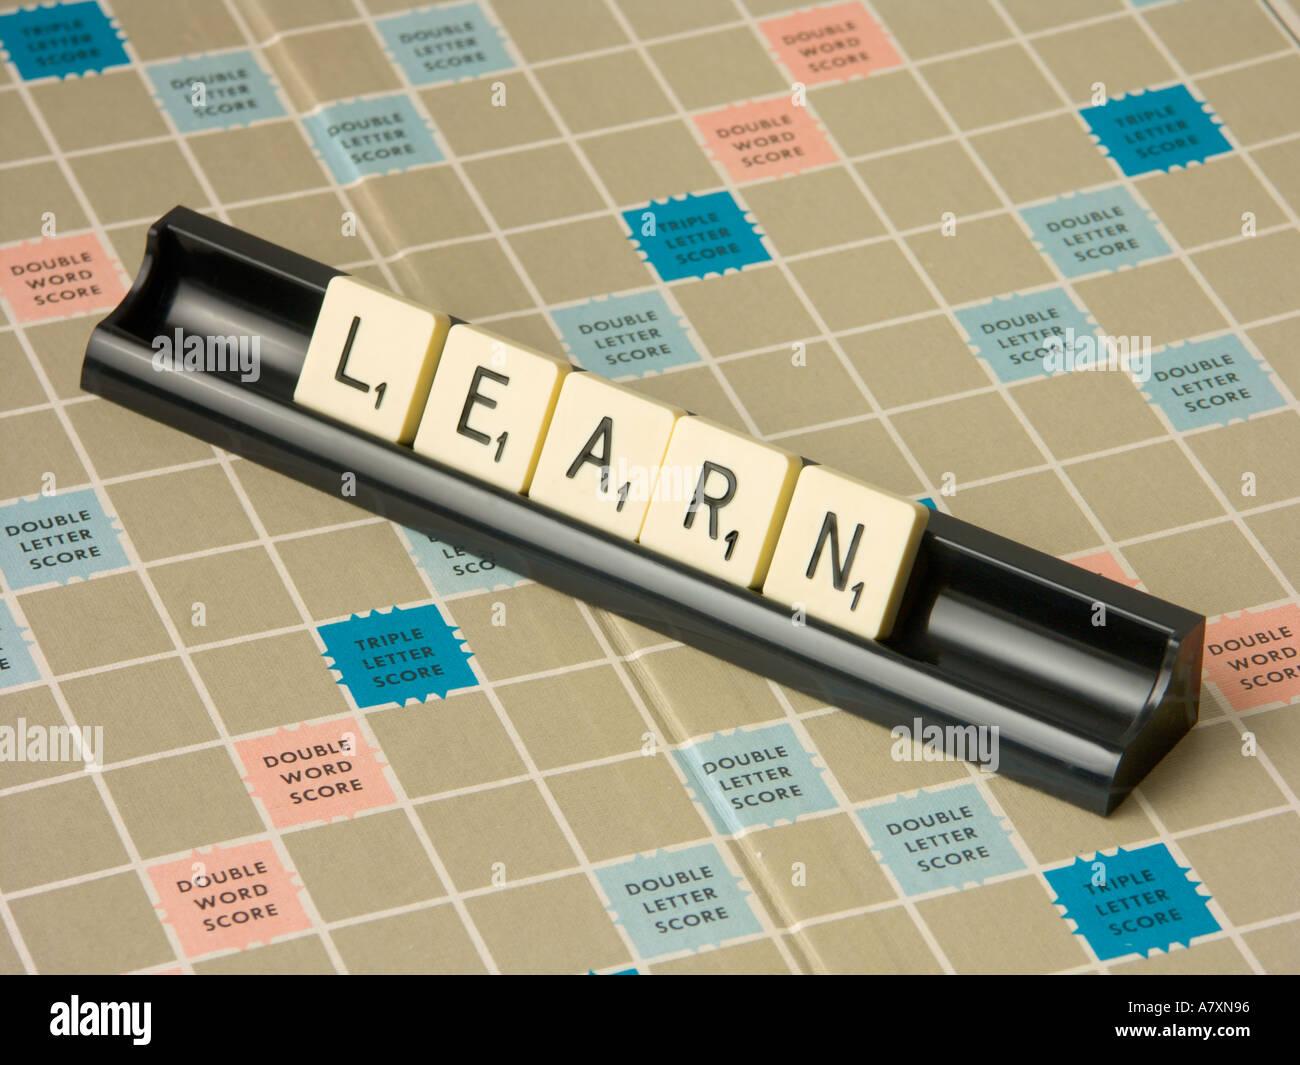 Two letter words scrabble uk